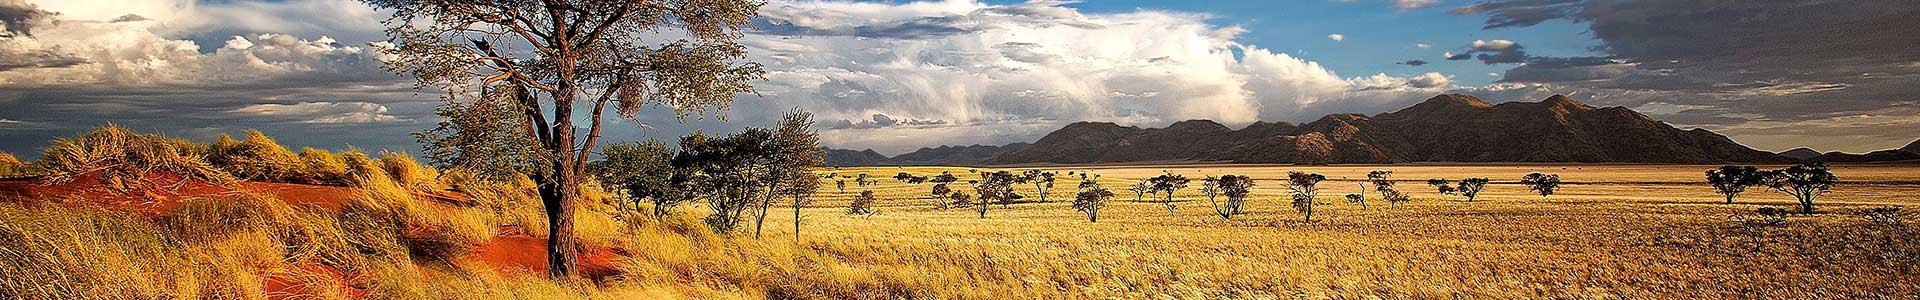 Voyage en Namibie - TUI